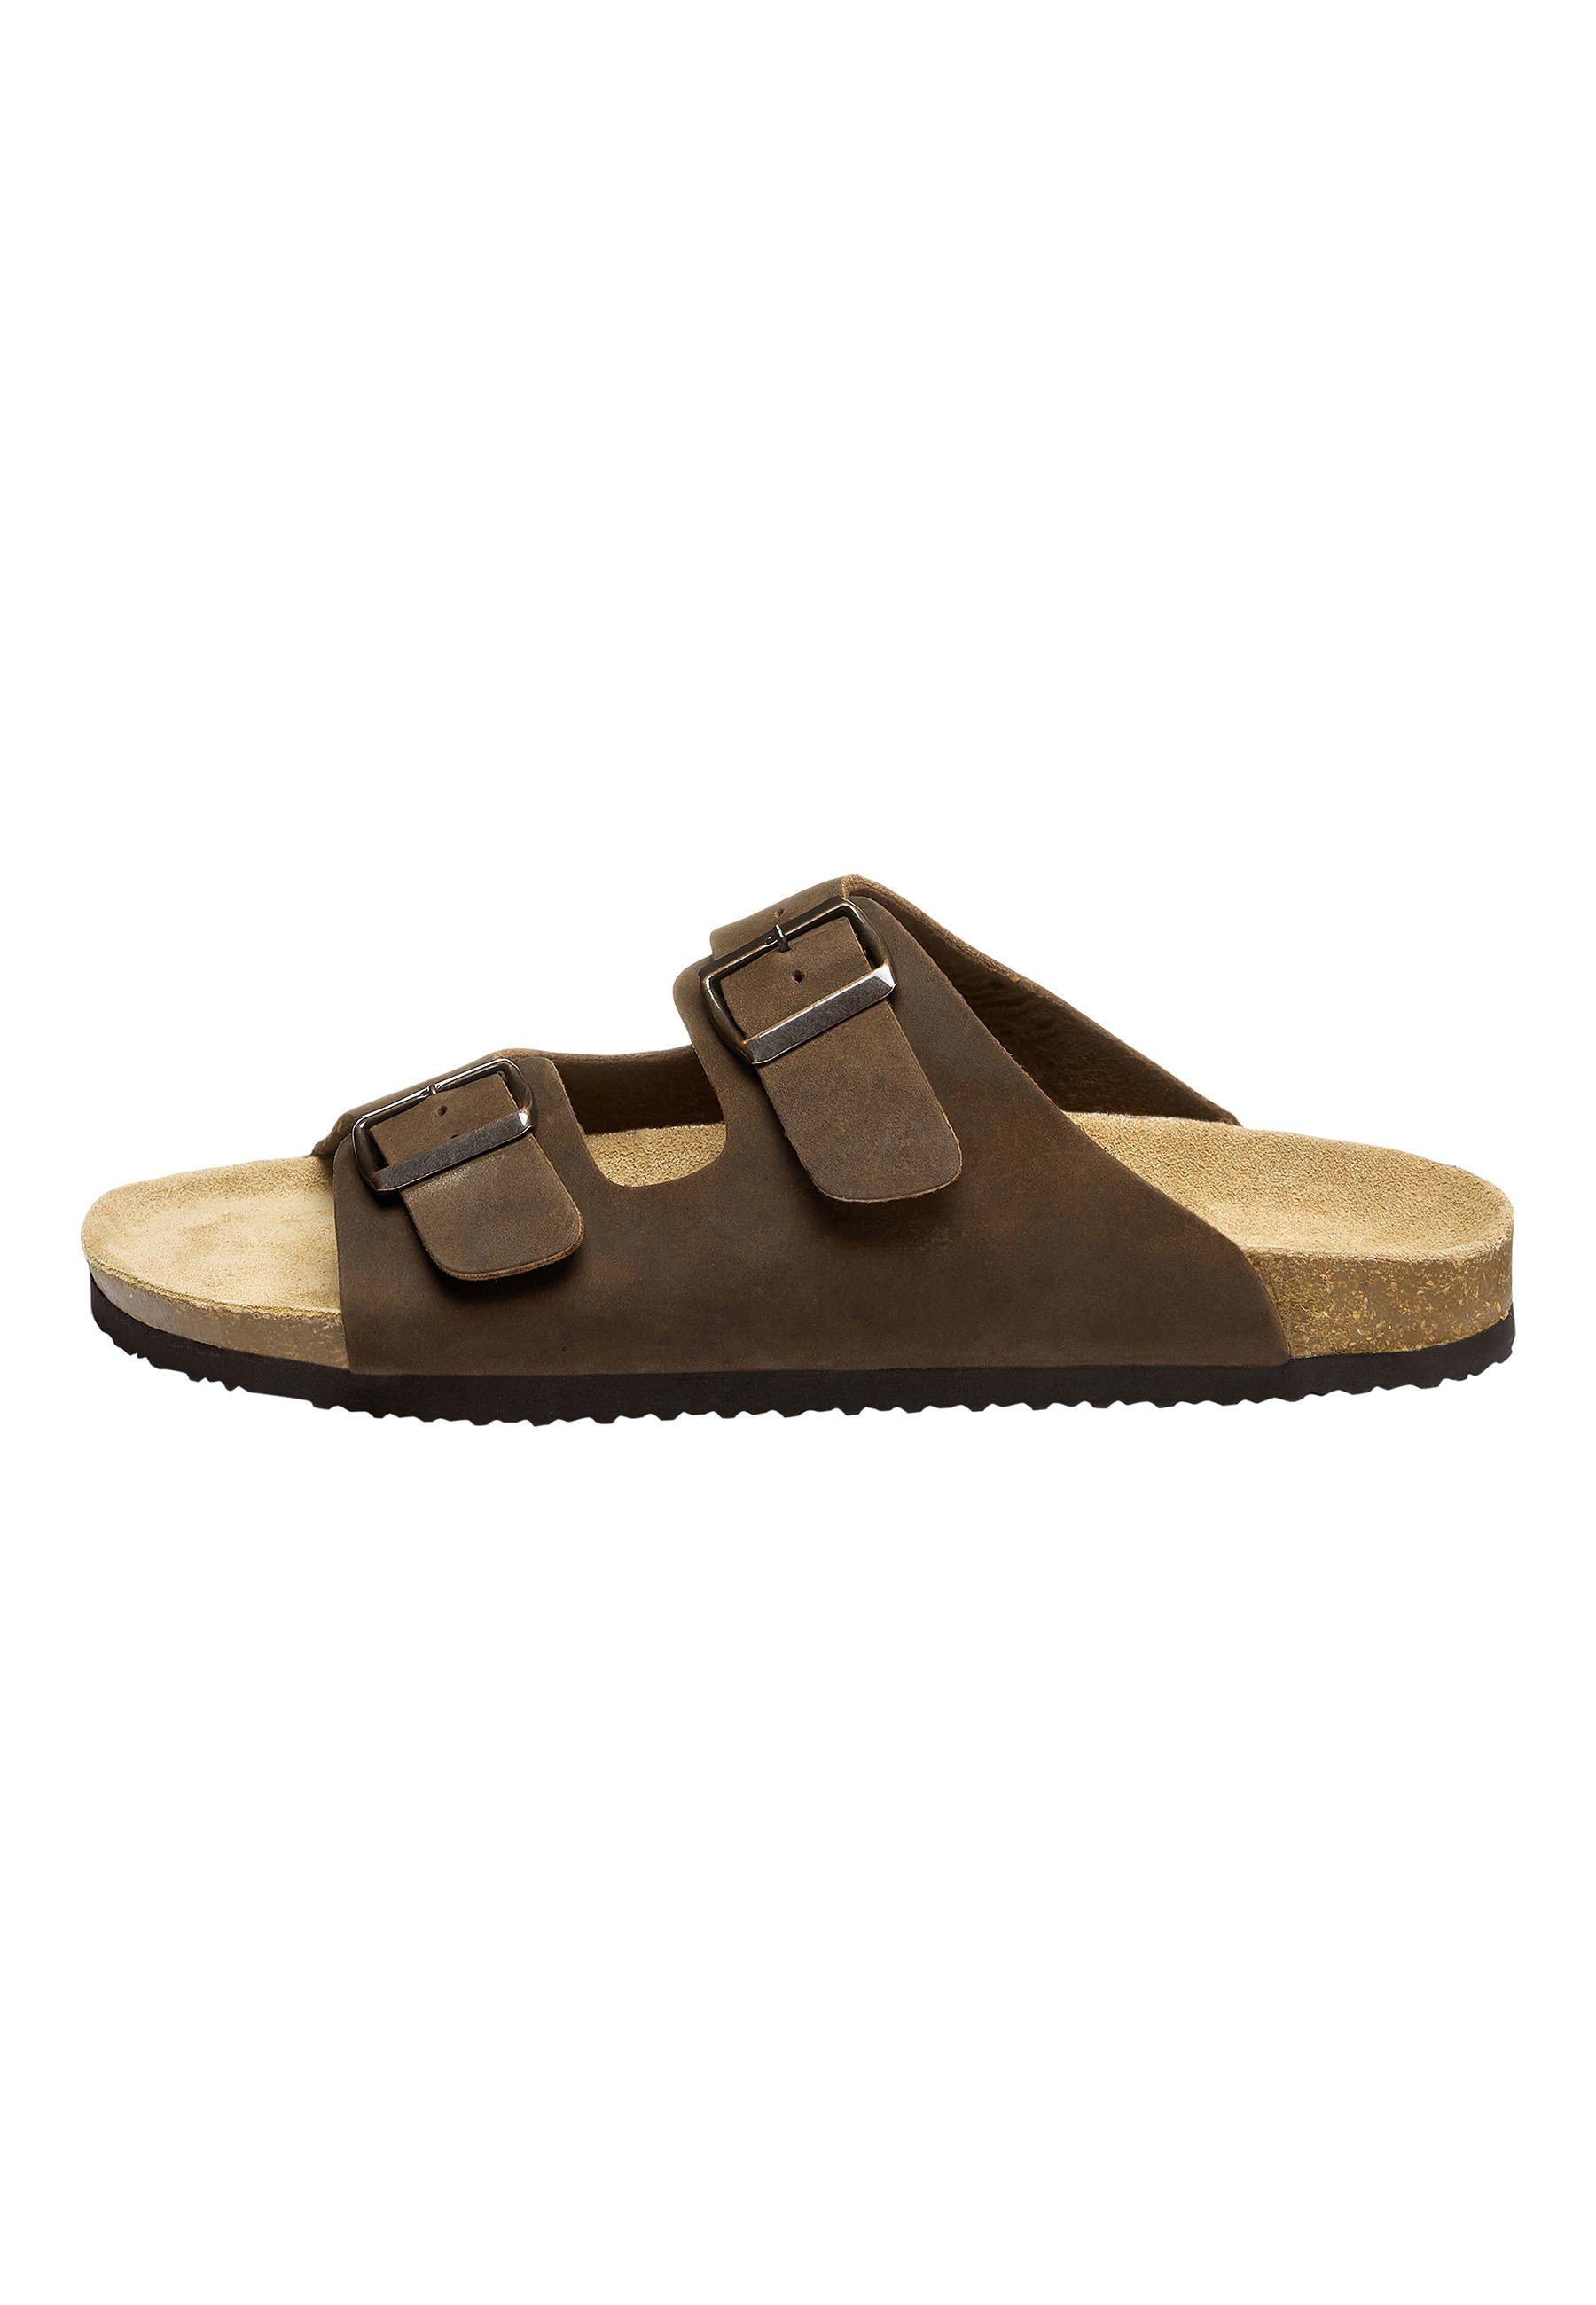 Uomo BROWN TWO BUCKLE SANDAL - Pantofole